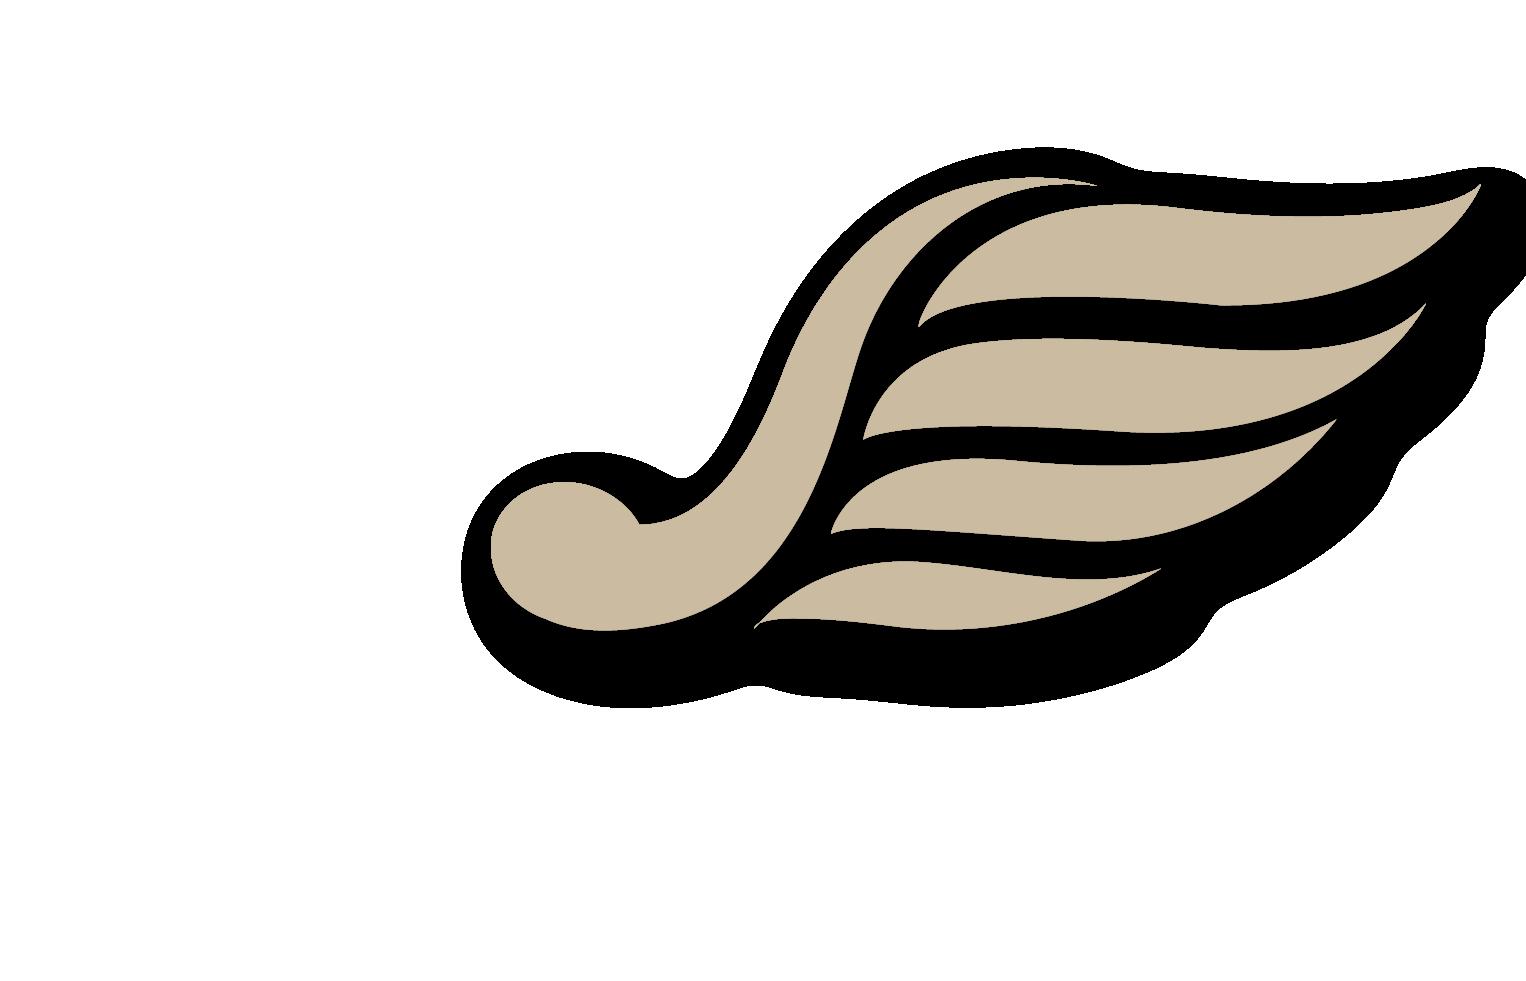 SA3-Beurre-ZInc-base-graphic-f2-15.png